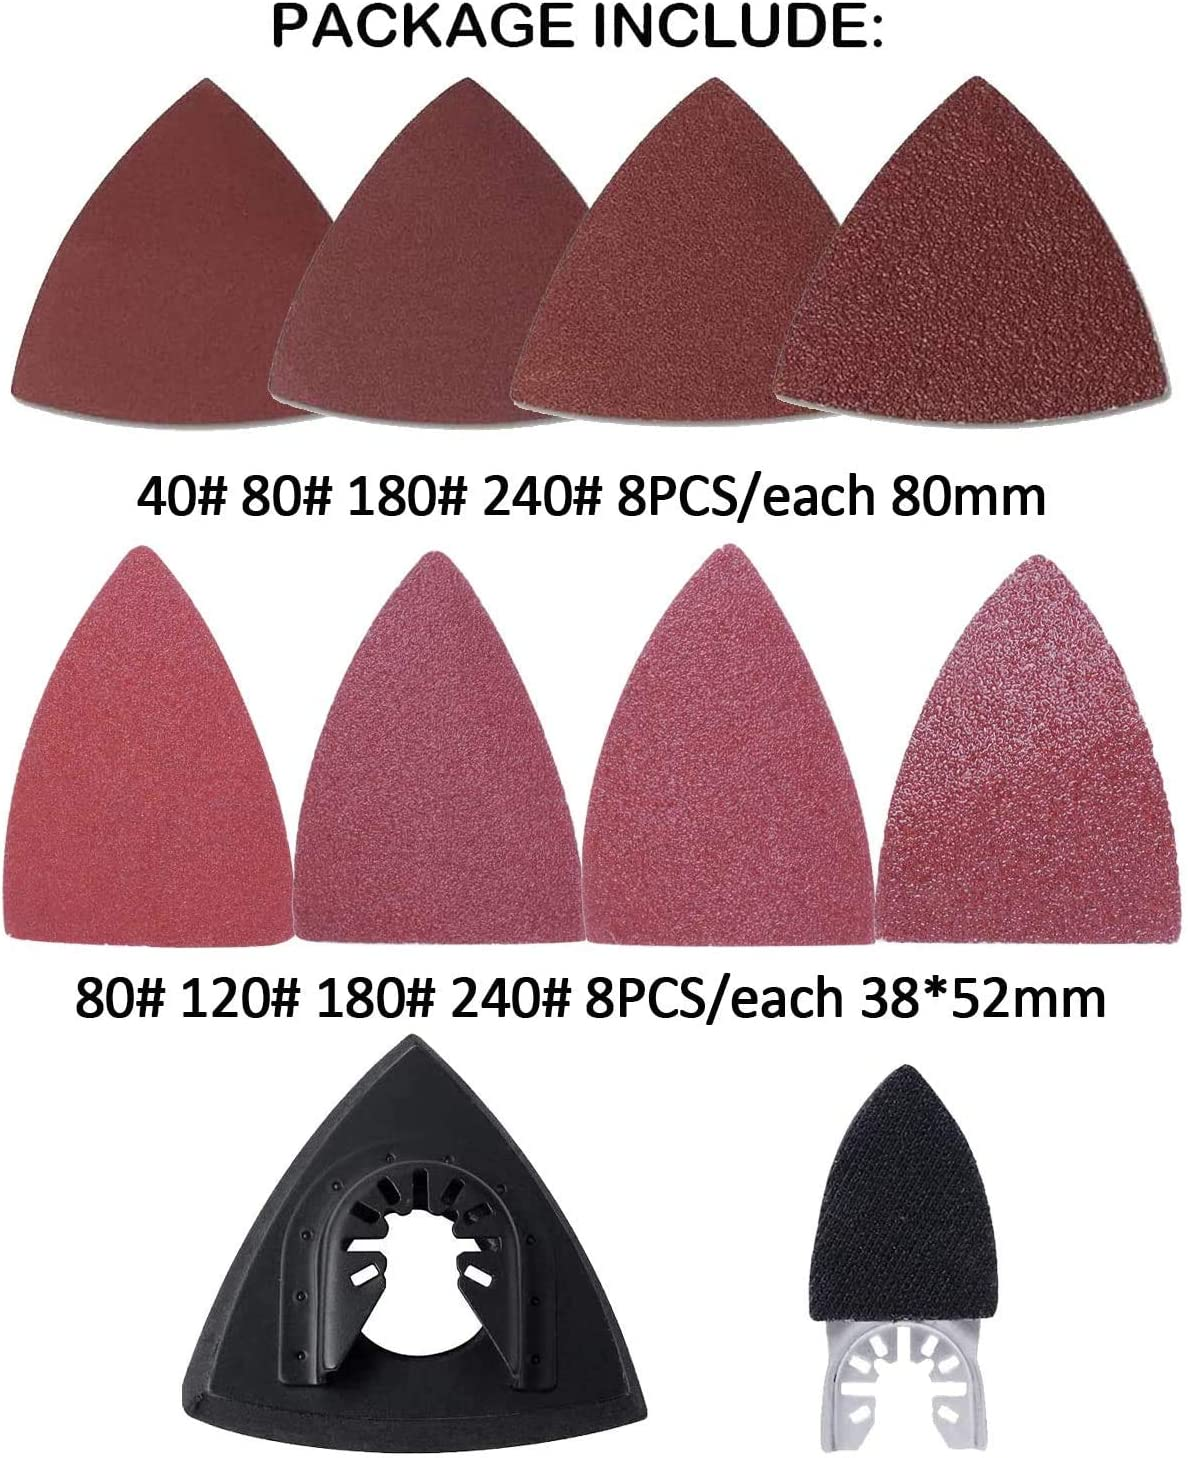 Kit de Lijado Triangulares Compatibles con Bosch Dewalt Fein Dremel Makita Milwaukee Porter Cable Ridgid Ryobi Rockwell Por Poweka